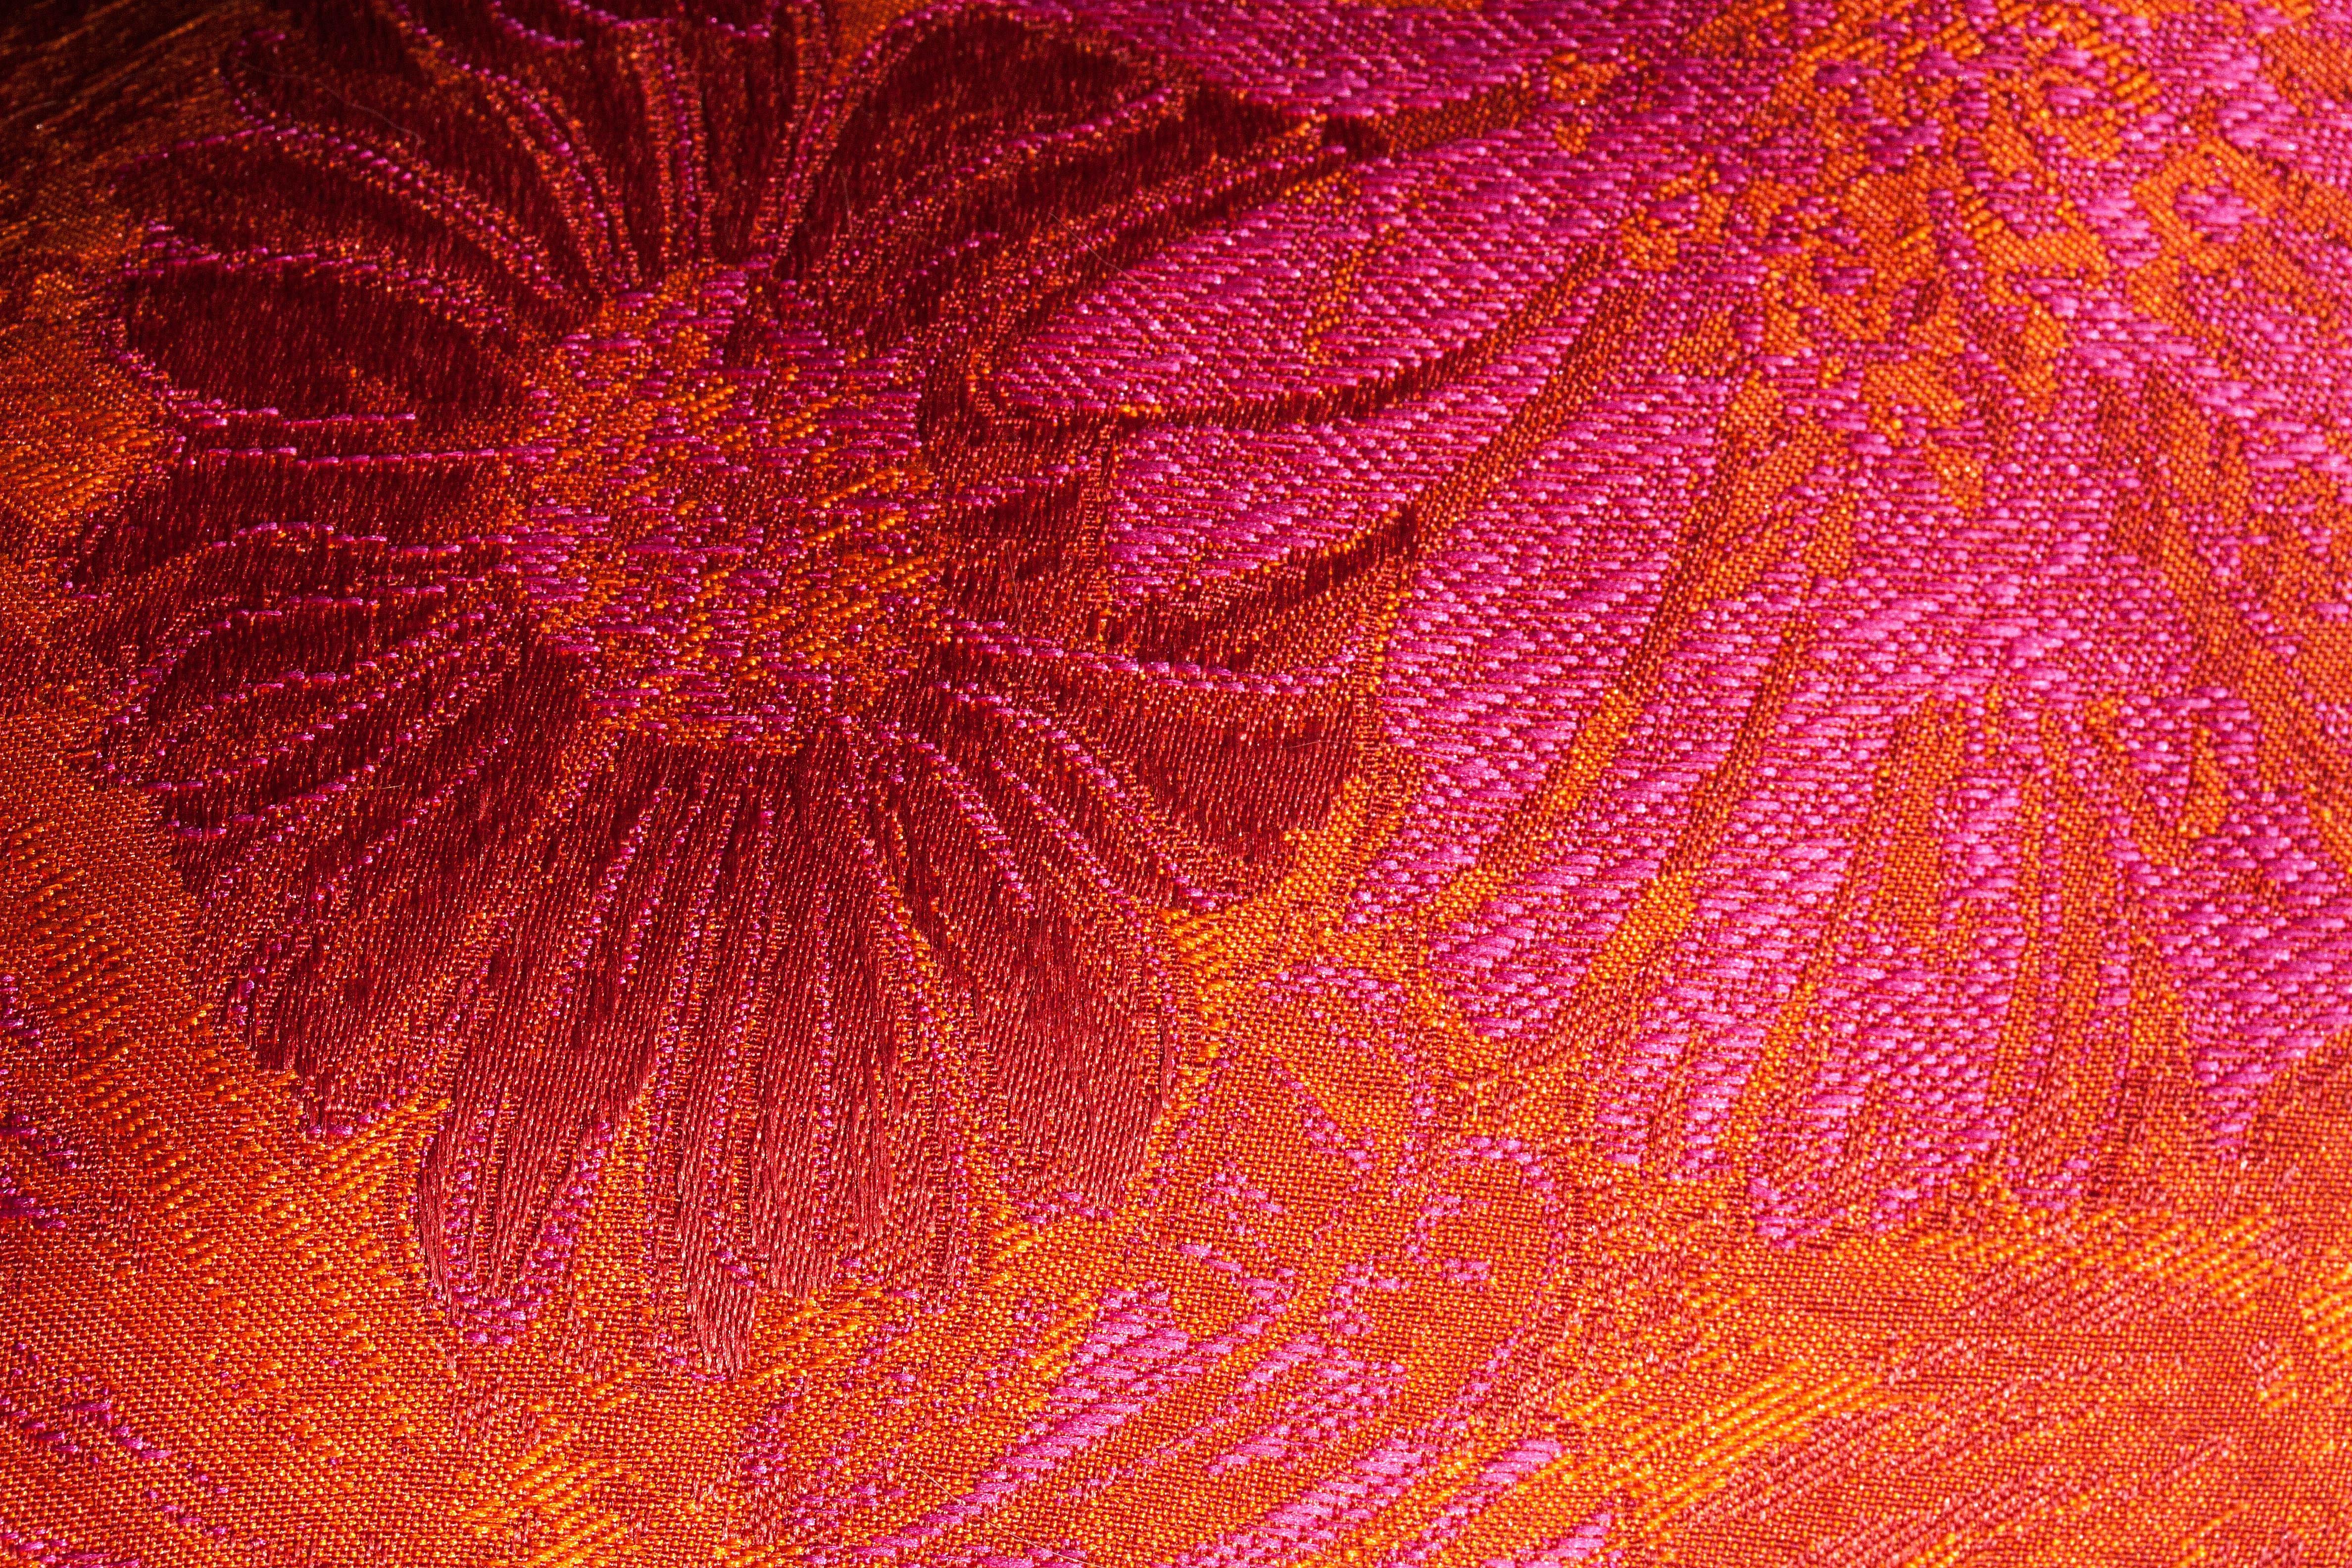 Free Images : texture, leaf, flower, petal, orange, pattern, red ...